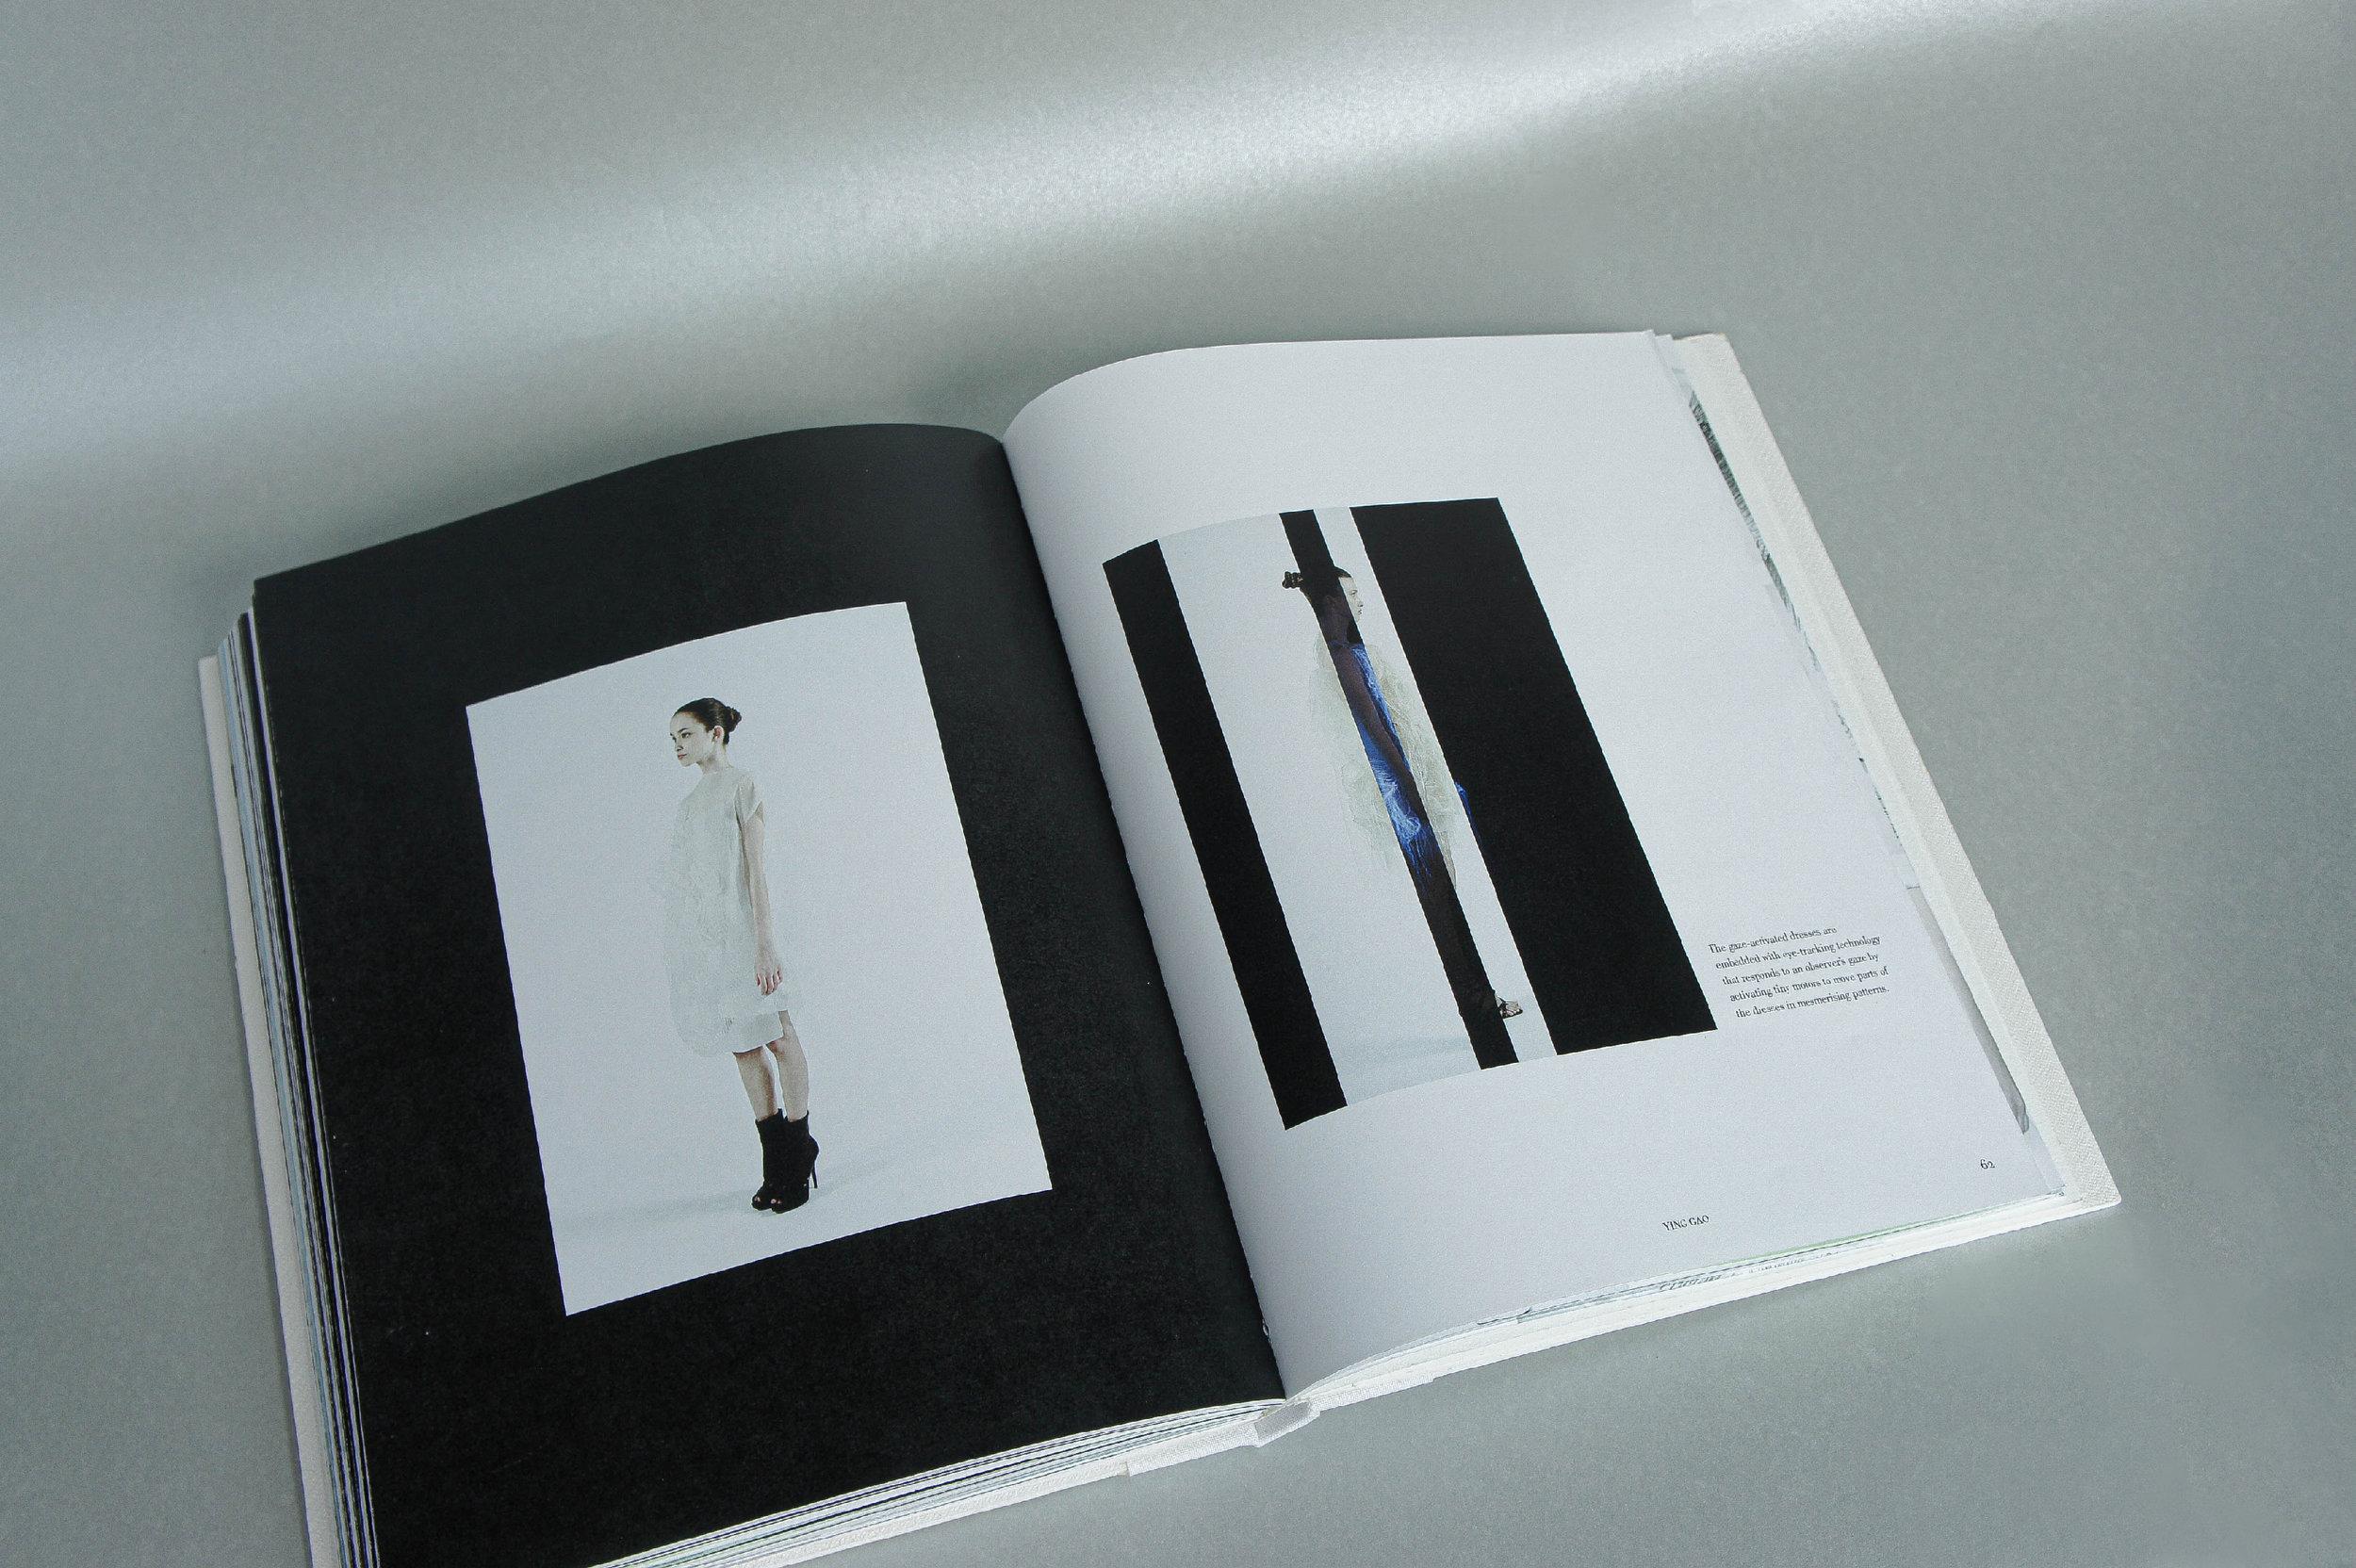 edited_book 4.jpg